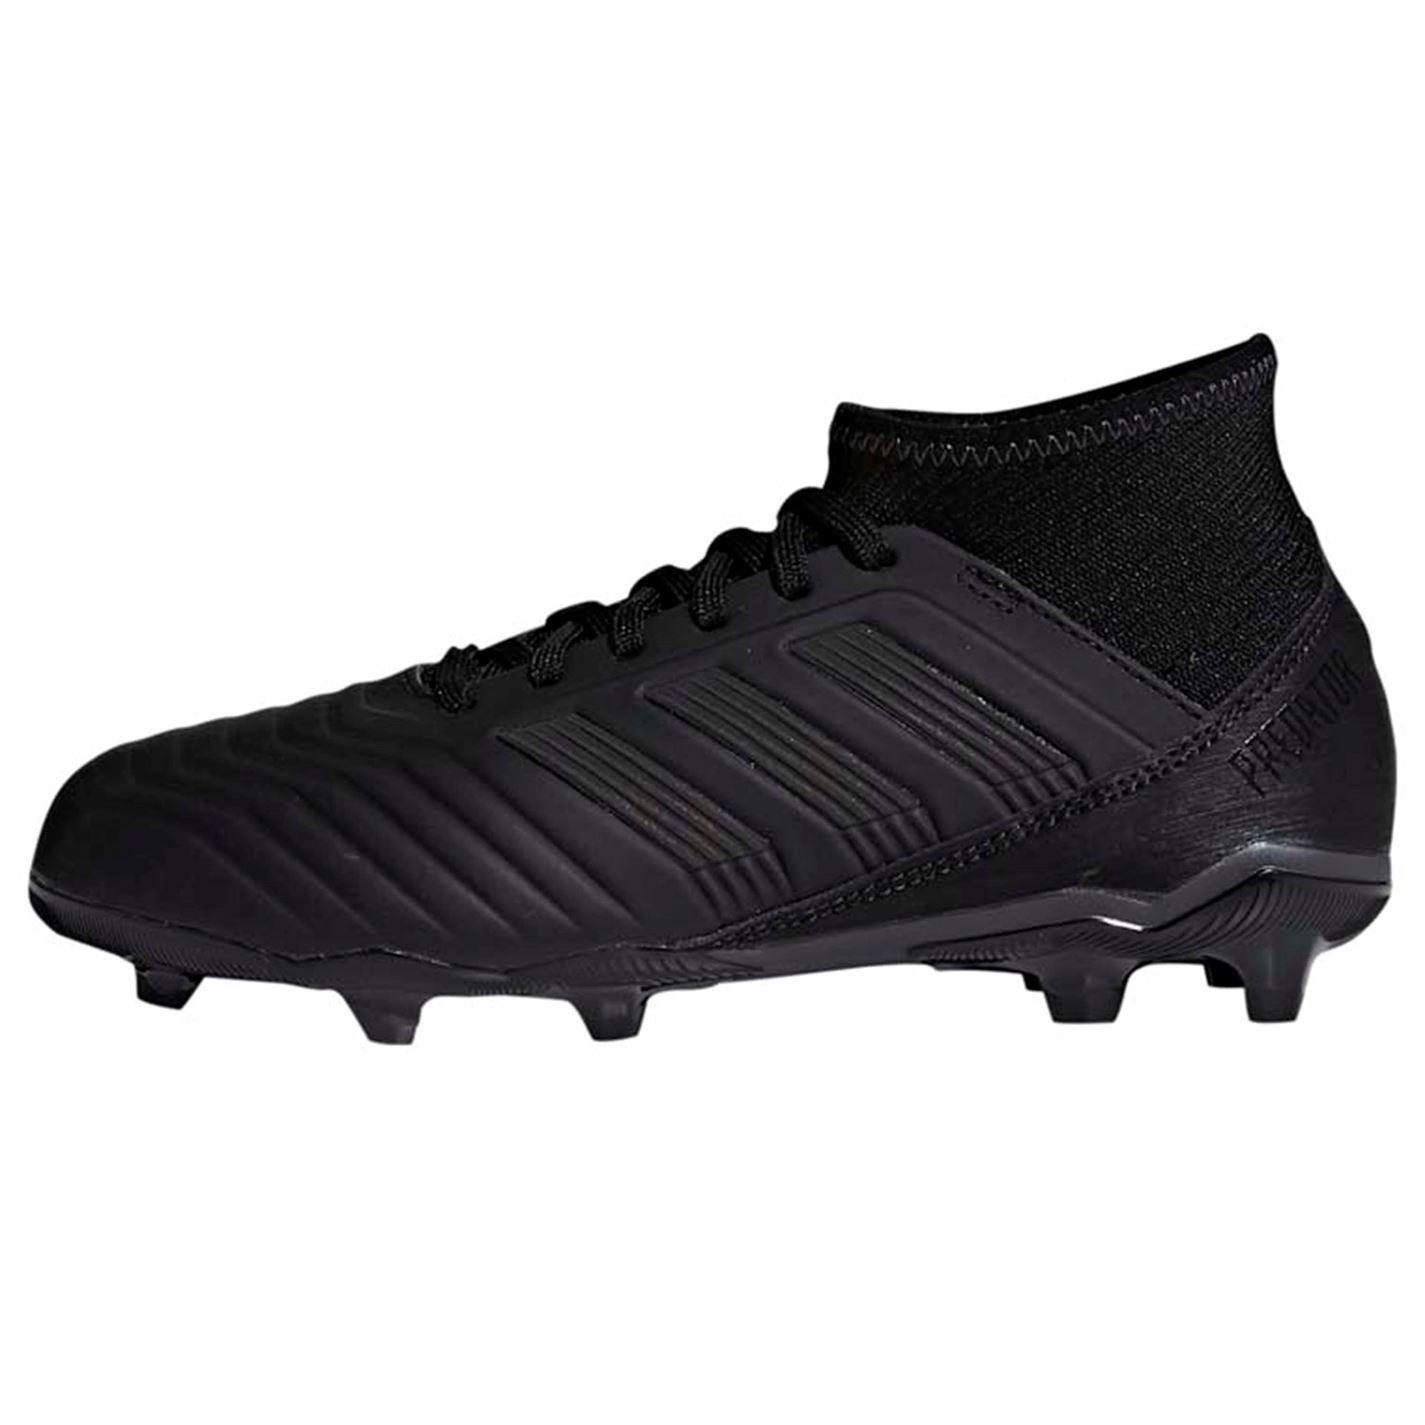 1535bf721 ... adidas Predator 18.3 FG Firm Ground Football Boots Juniors Black Soccer  Cleats ...